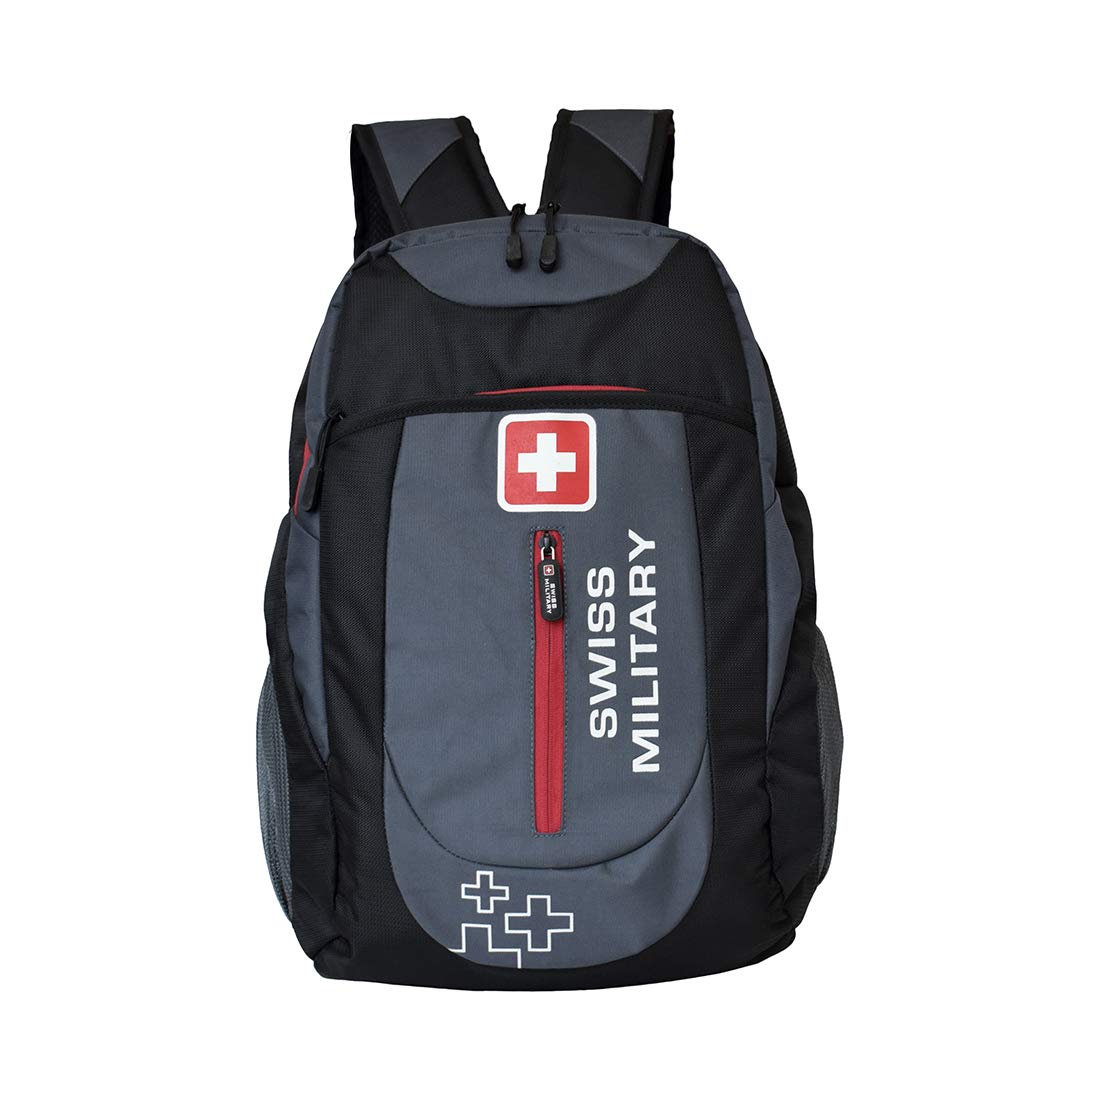 Swiss Military Grey and Black Laptop Bag (LBP40)